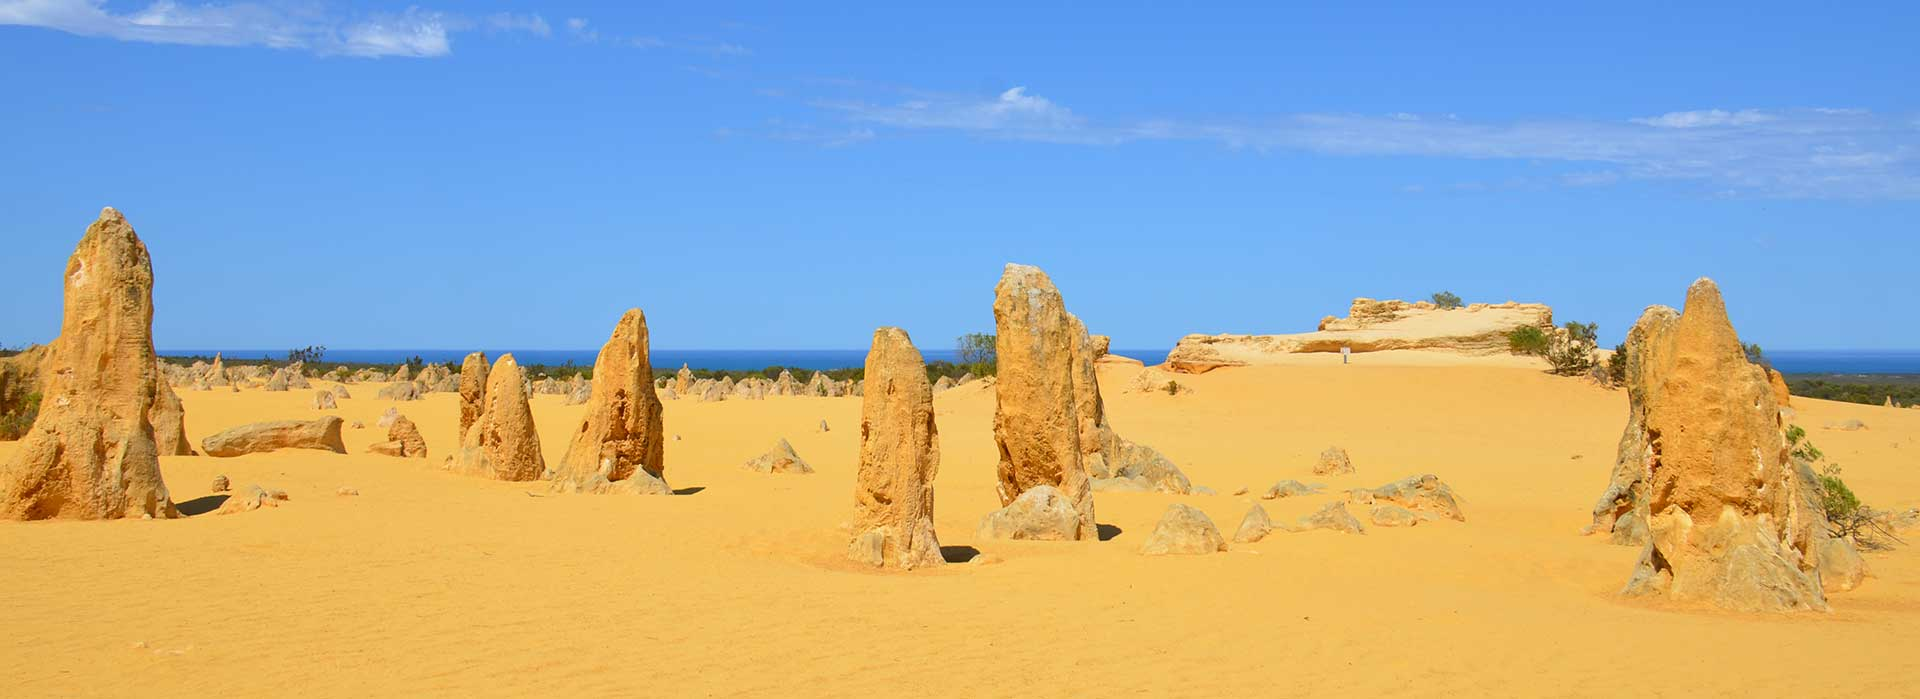 Image of desert formations in Western Australia